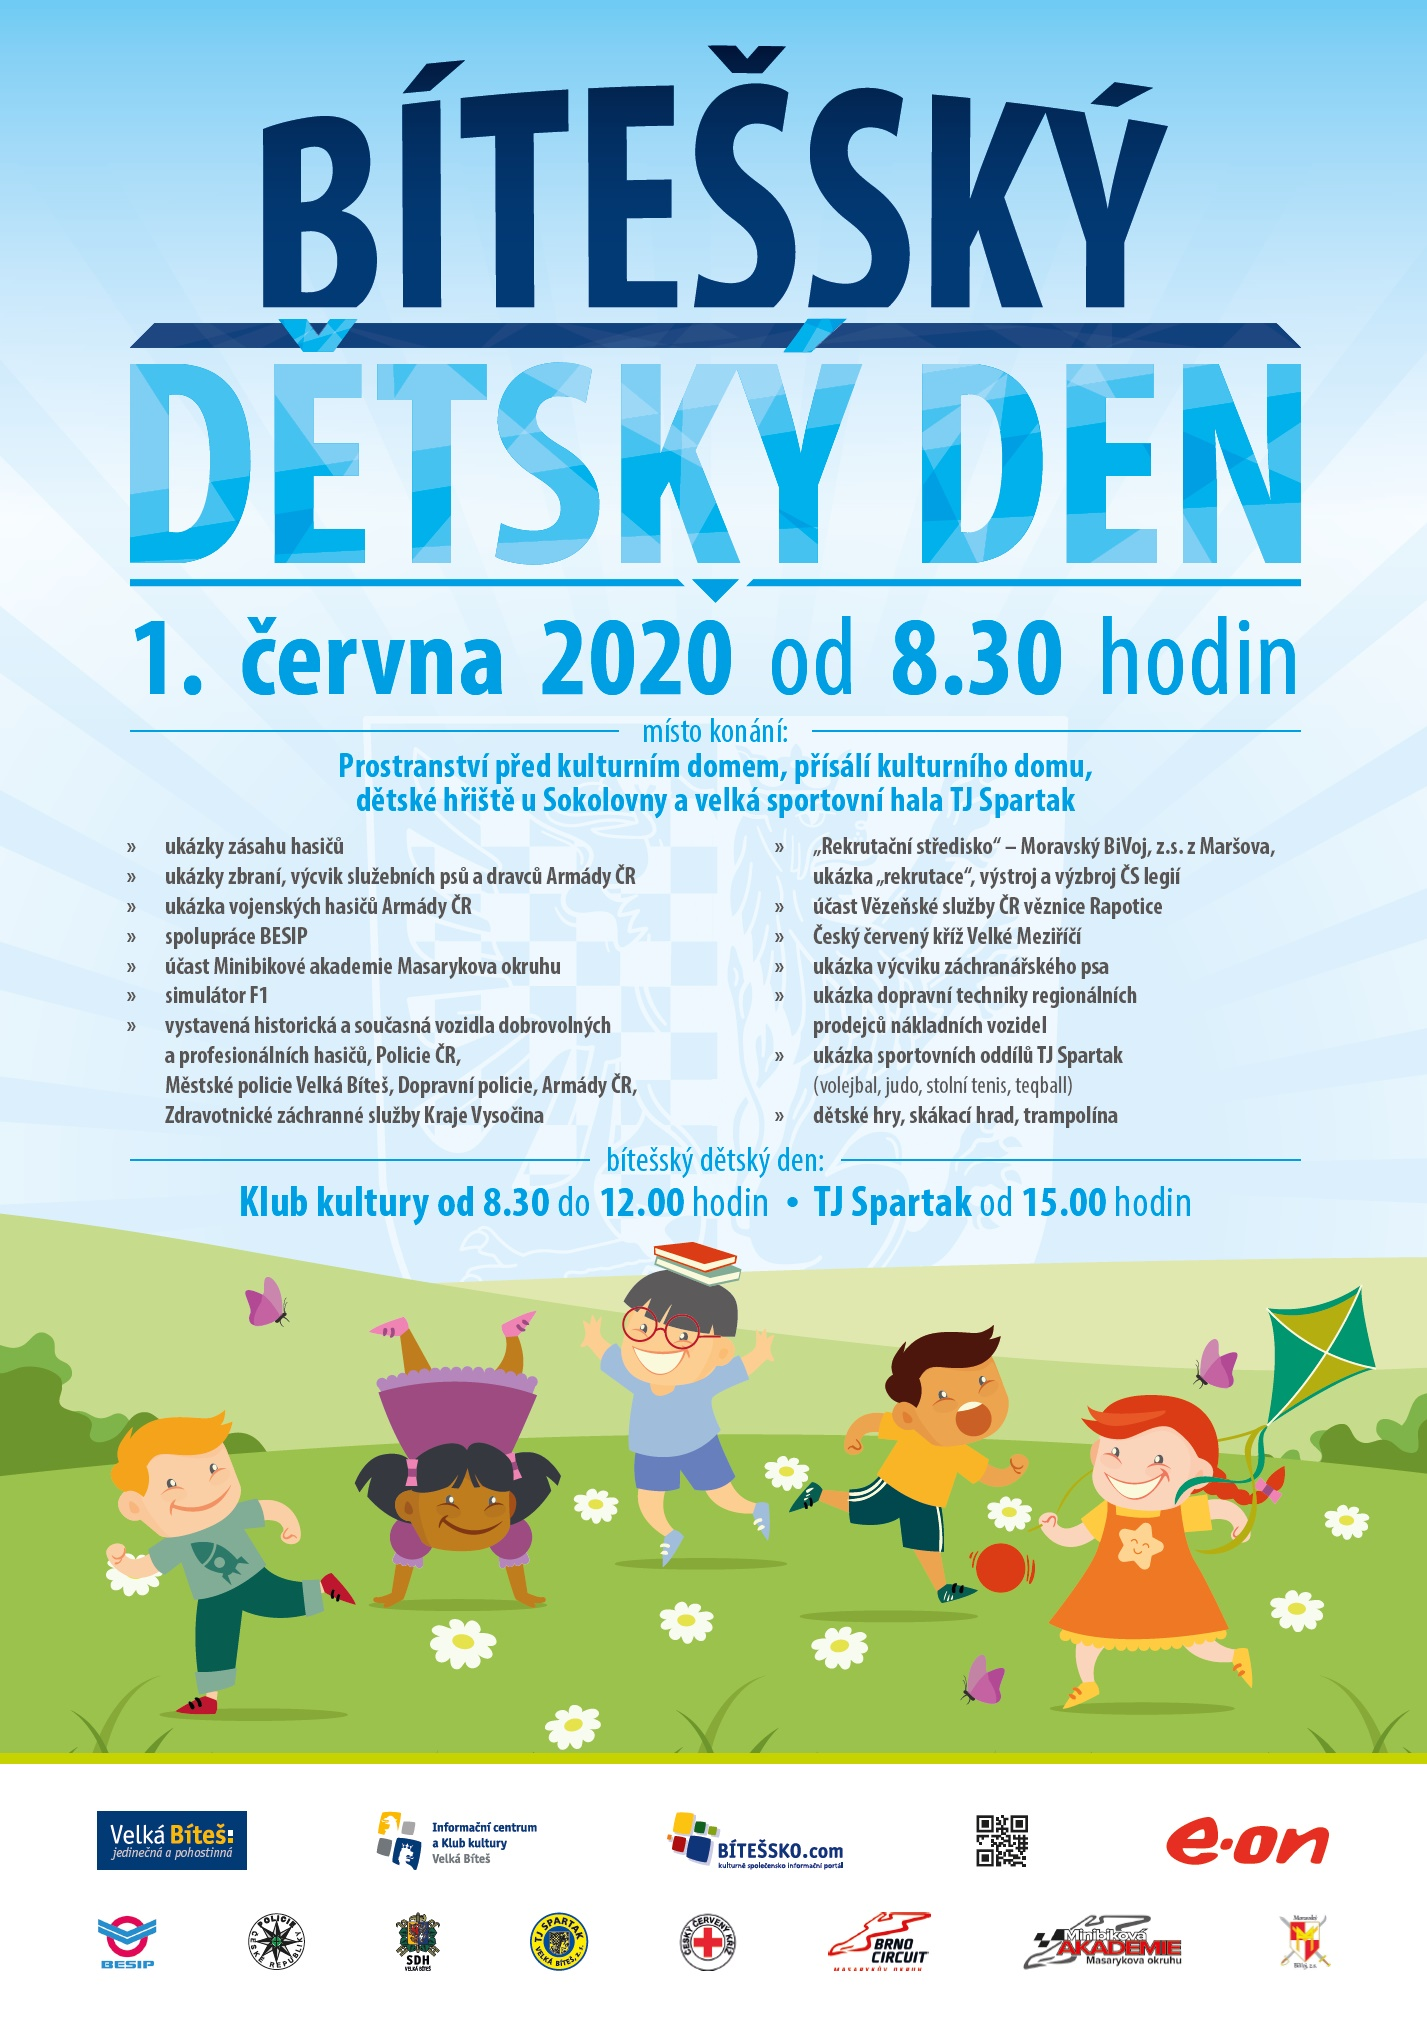 bdd 2020